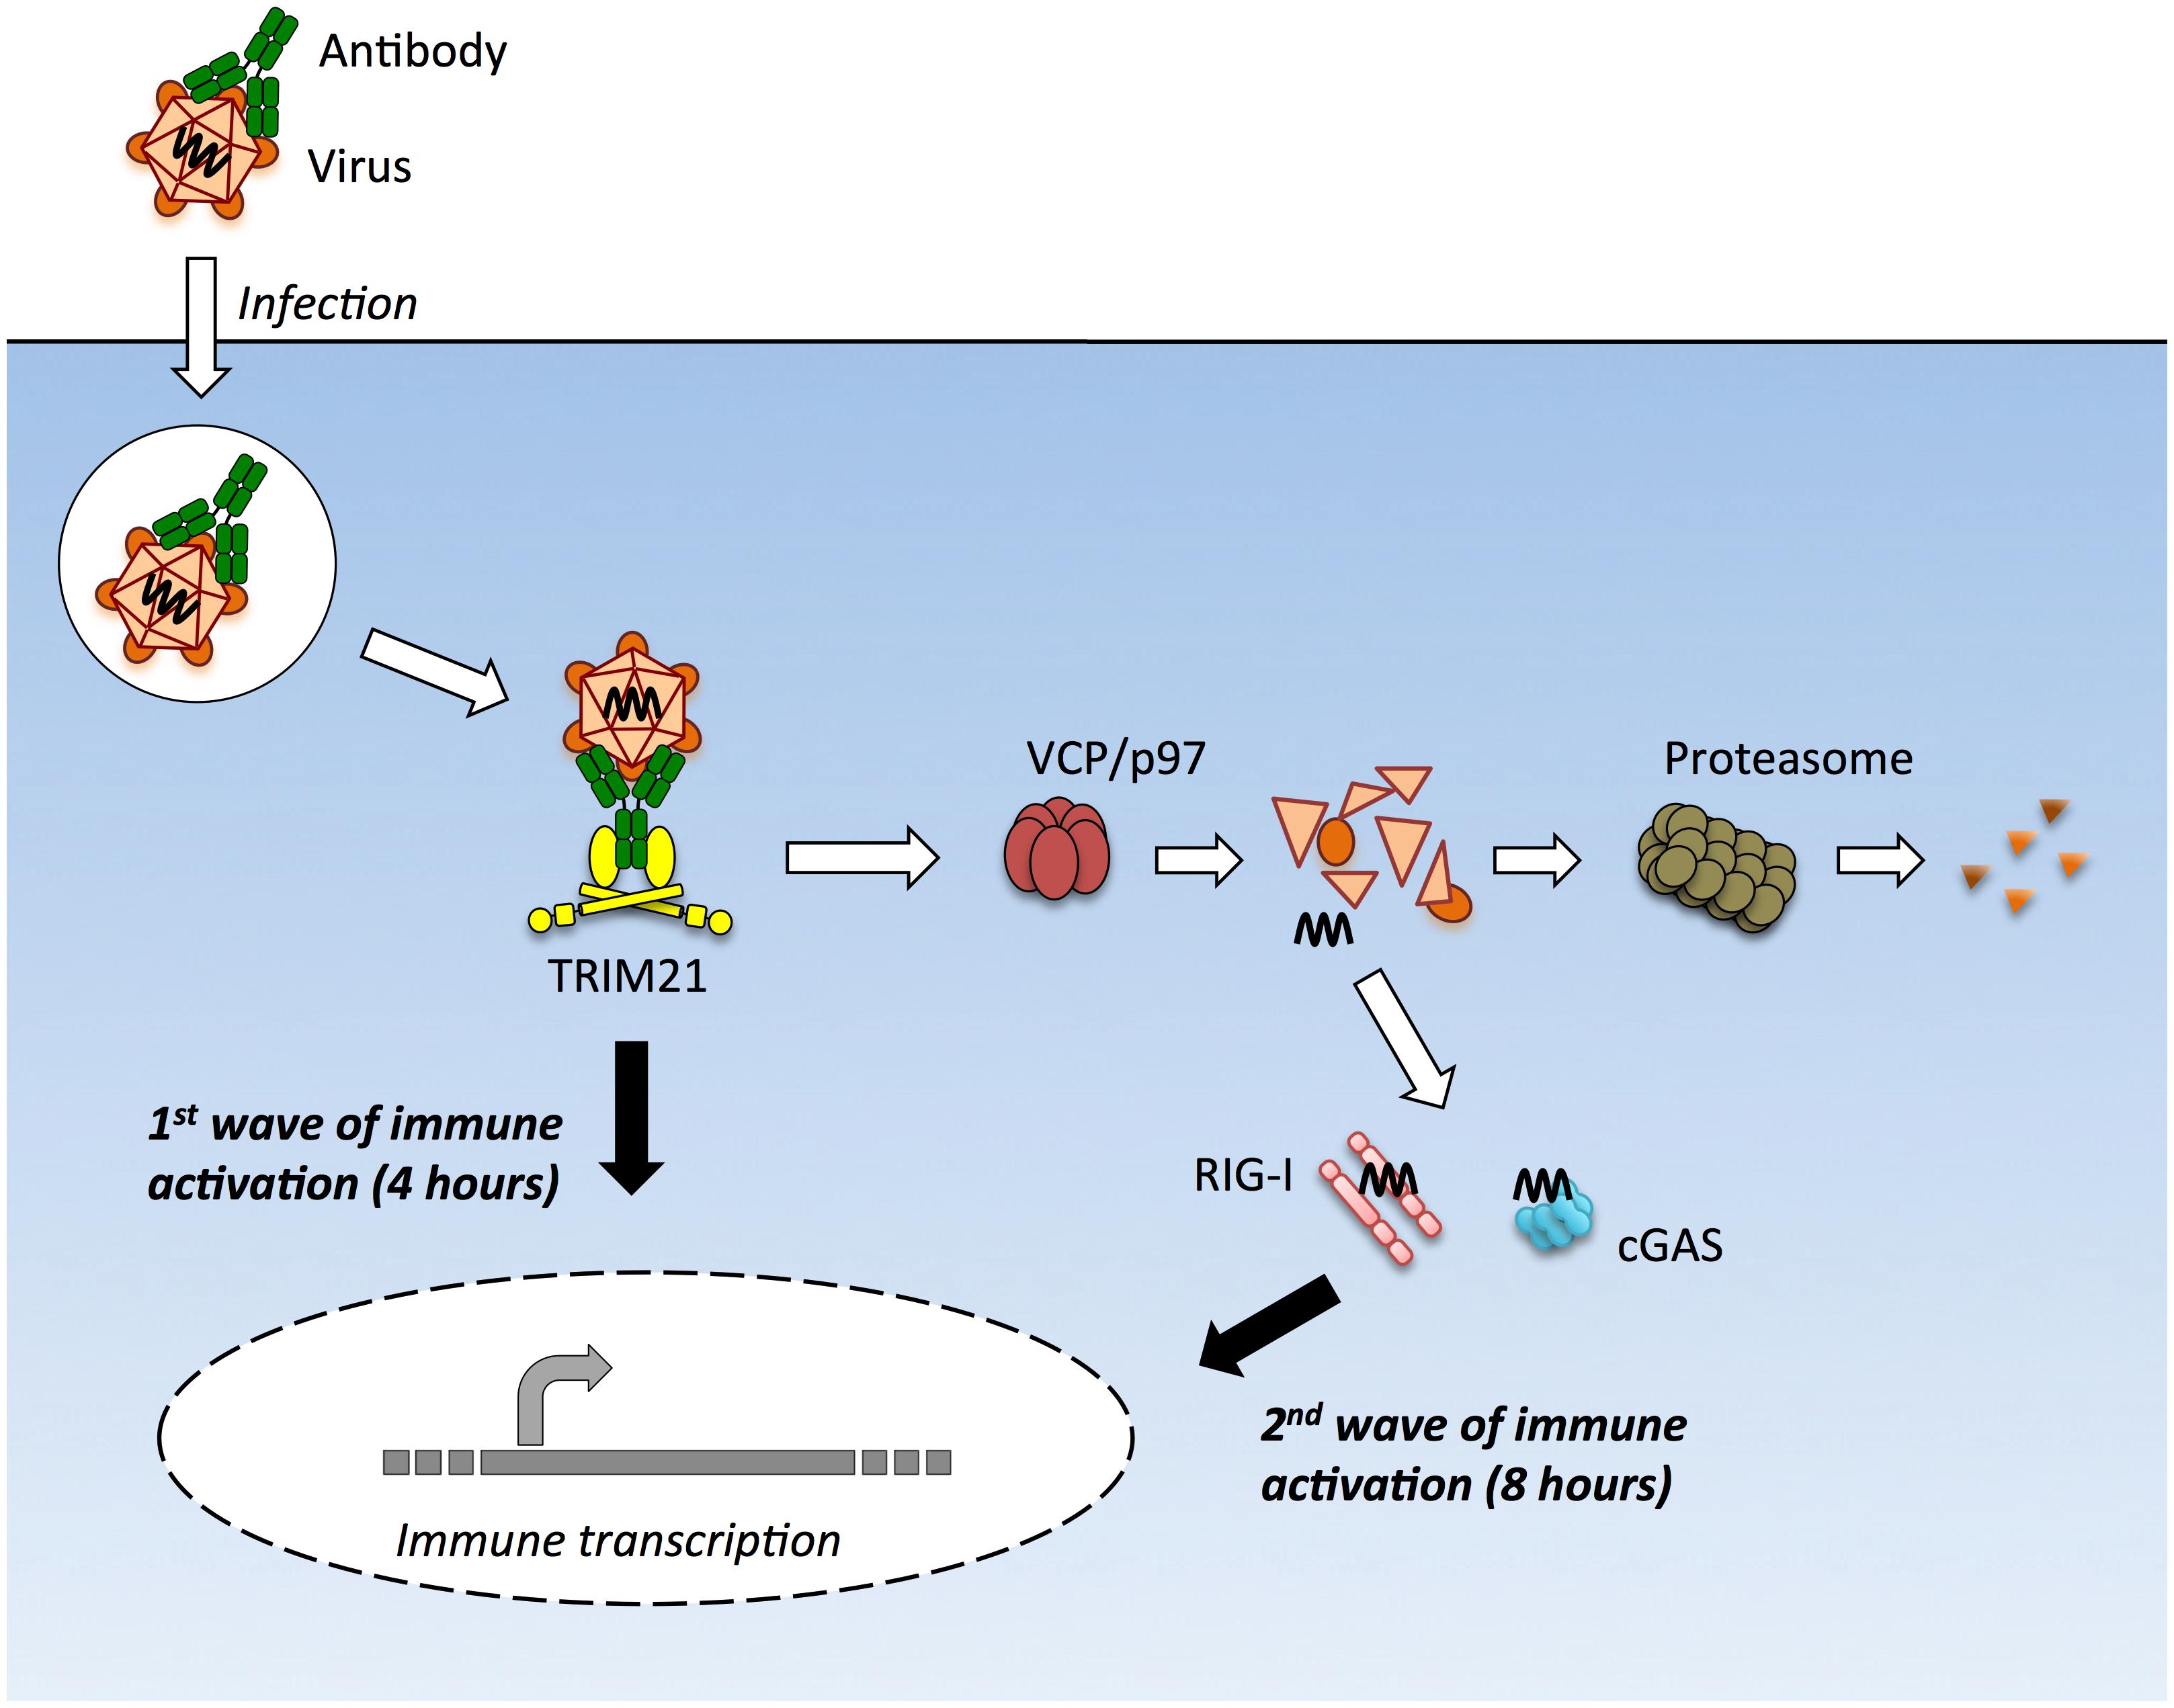 TRIM21 mediates multiple waves of immune sensing.